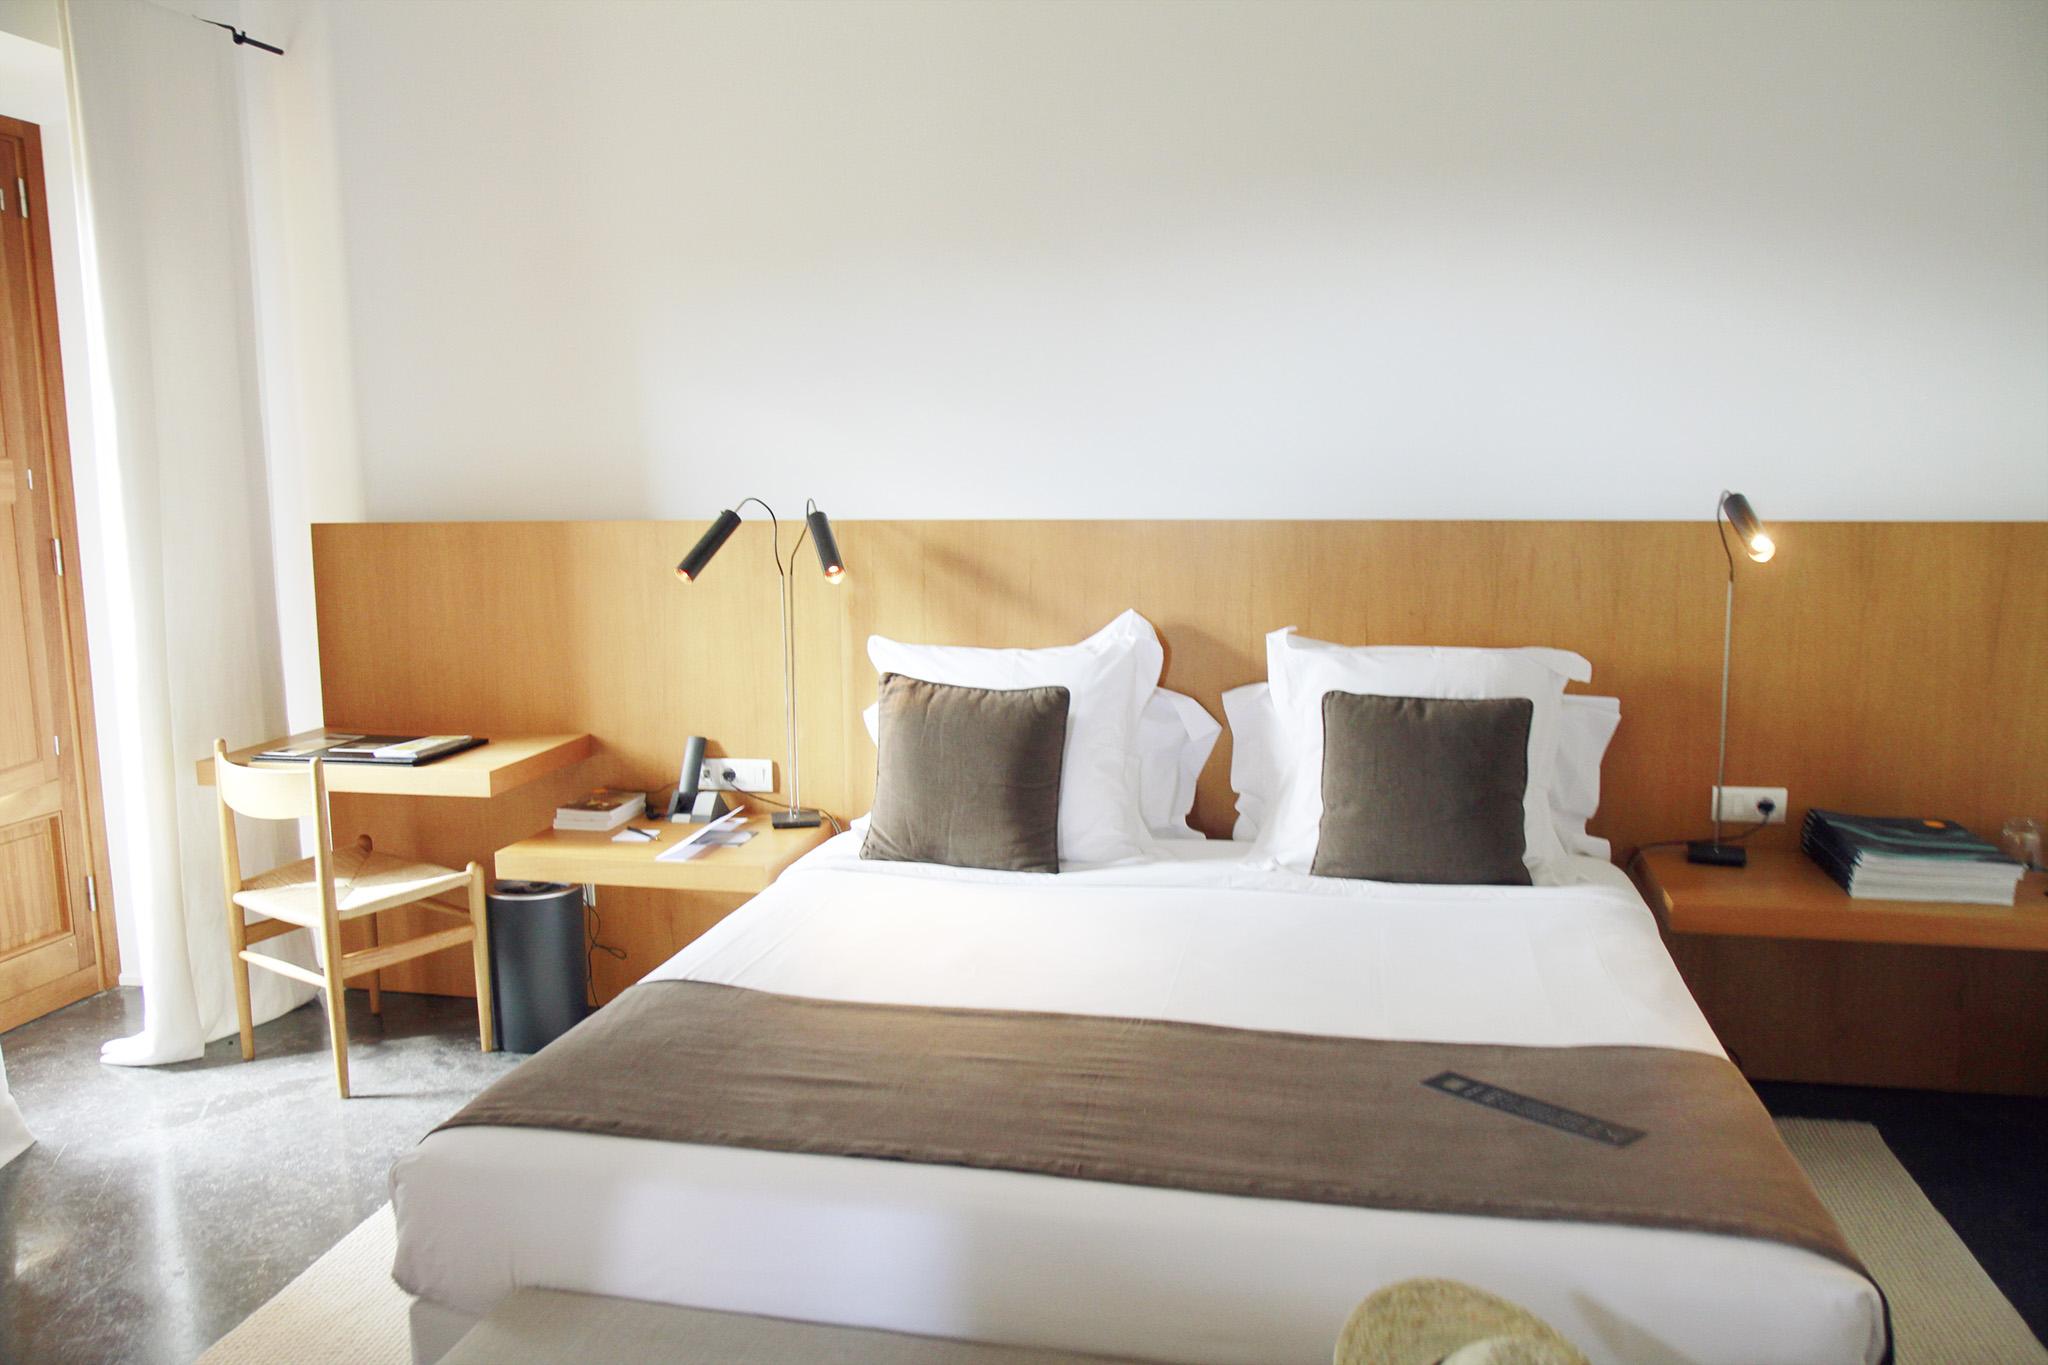 2017-04-Son-Brull - son-brull-hotel-spa-mallorca-nectarandpulse-bedroom-24.jpg